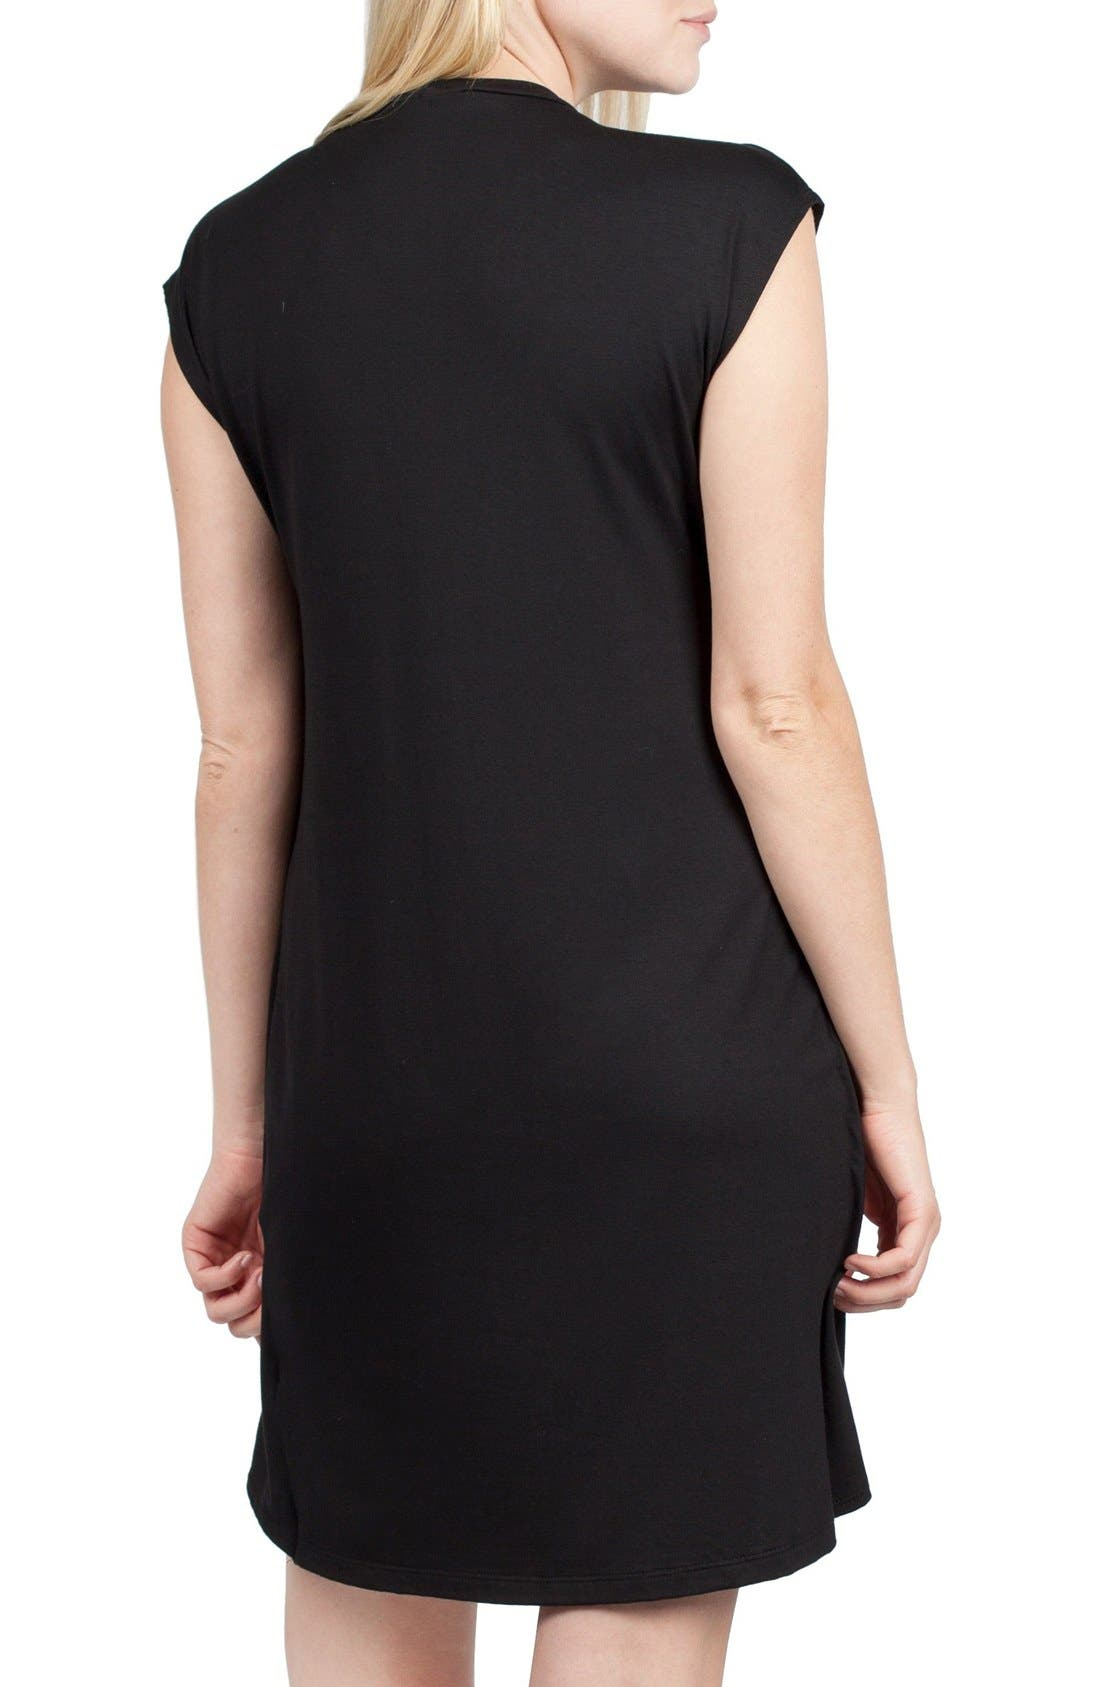 SAVI MOM,                             Lille Maternity/Nursing Tunic Dress,                             Alternate thumbnail 3, color,                             BLACK/ DUSTY PINK CONTRAST